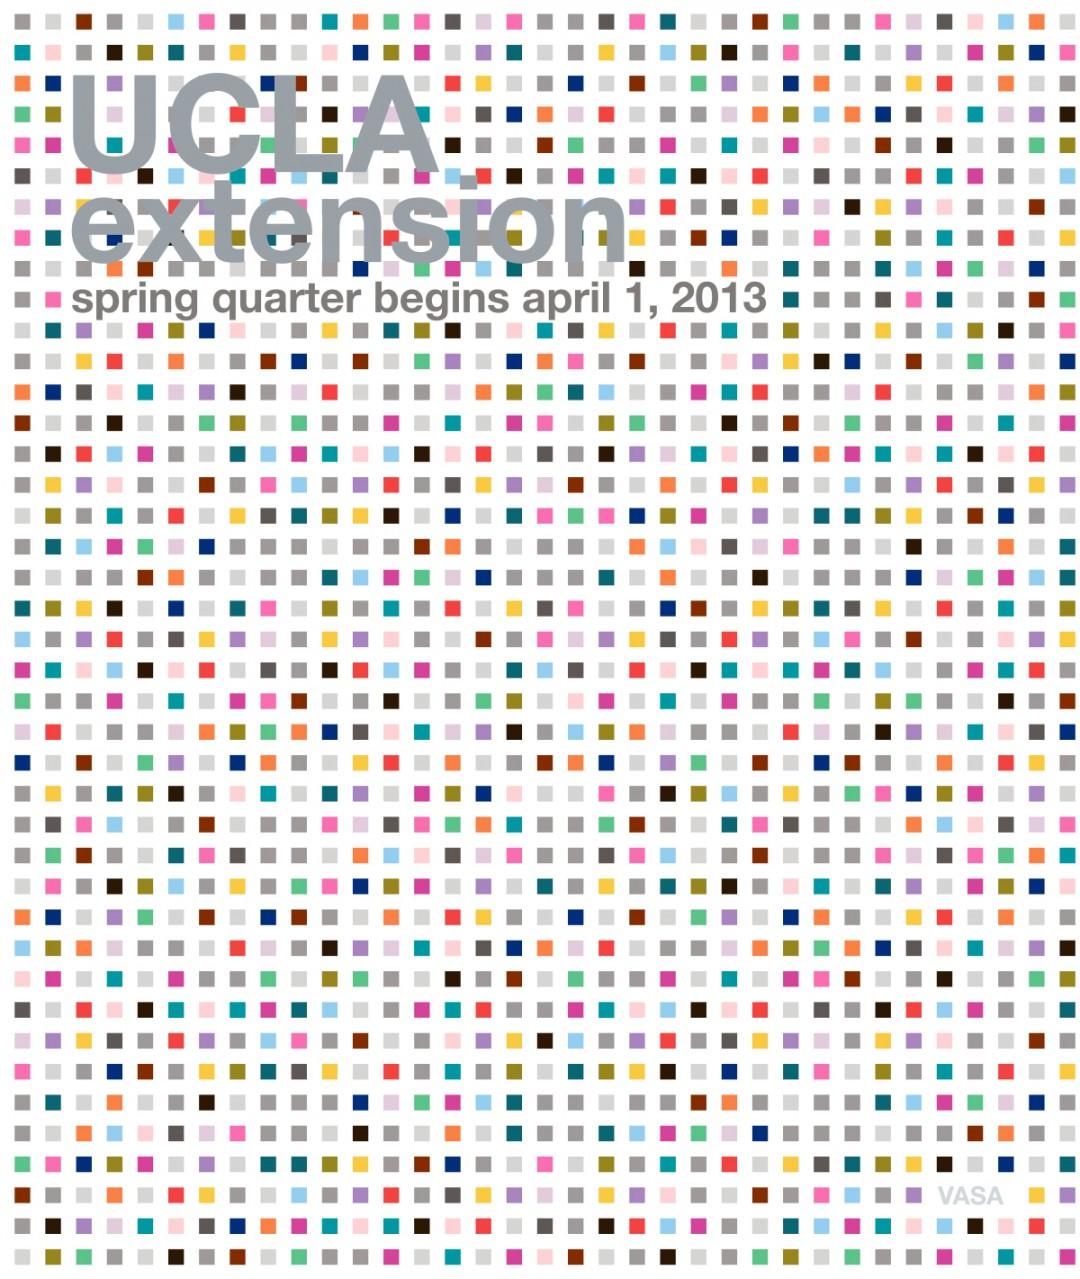 vasa-cover10-25x12_final-full_3-1200px-1080x1279